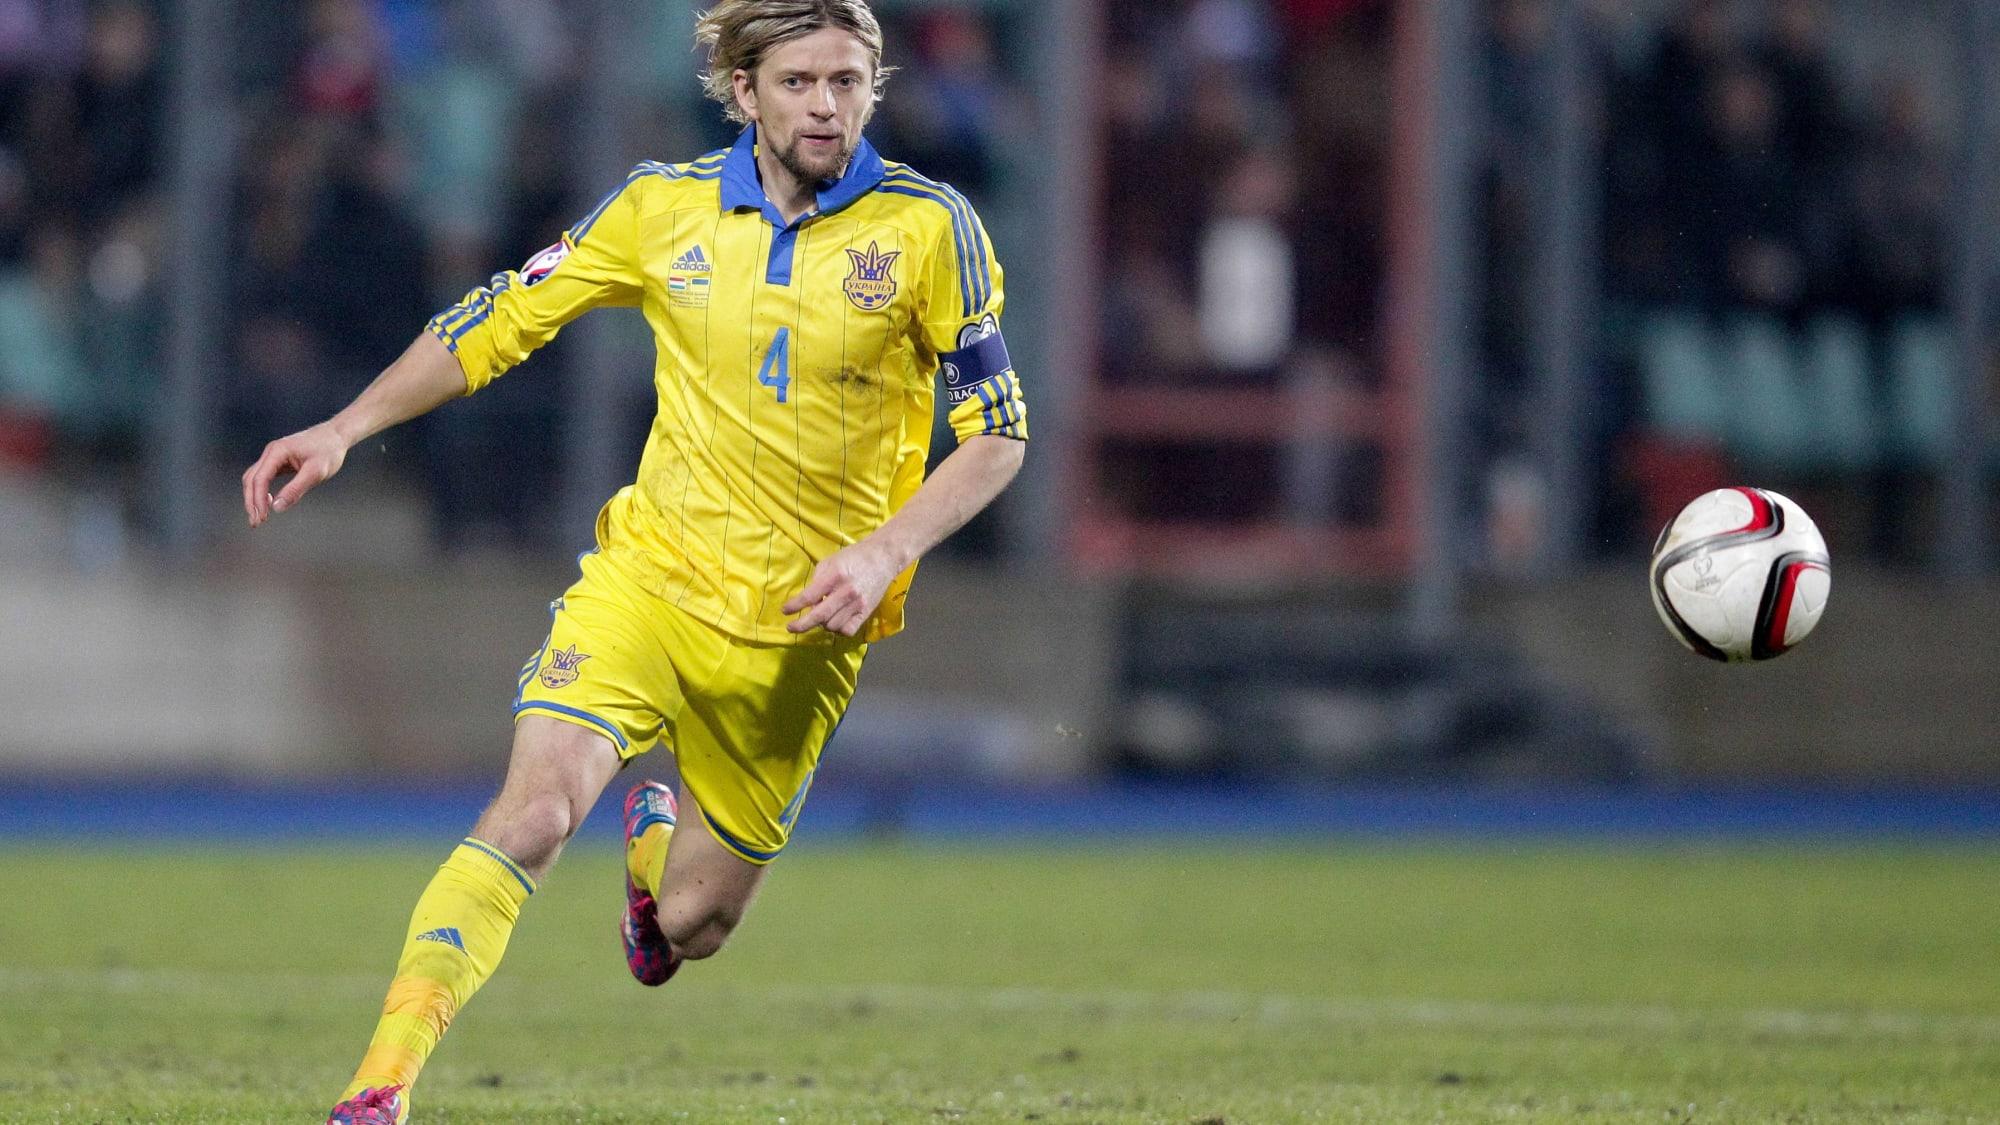 Europas Rekordnationalspieler: CR7 überholt Ramos - kicker